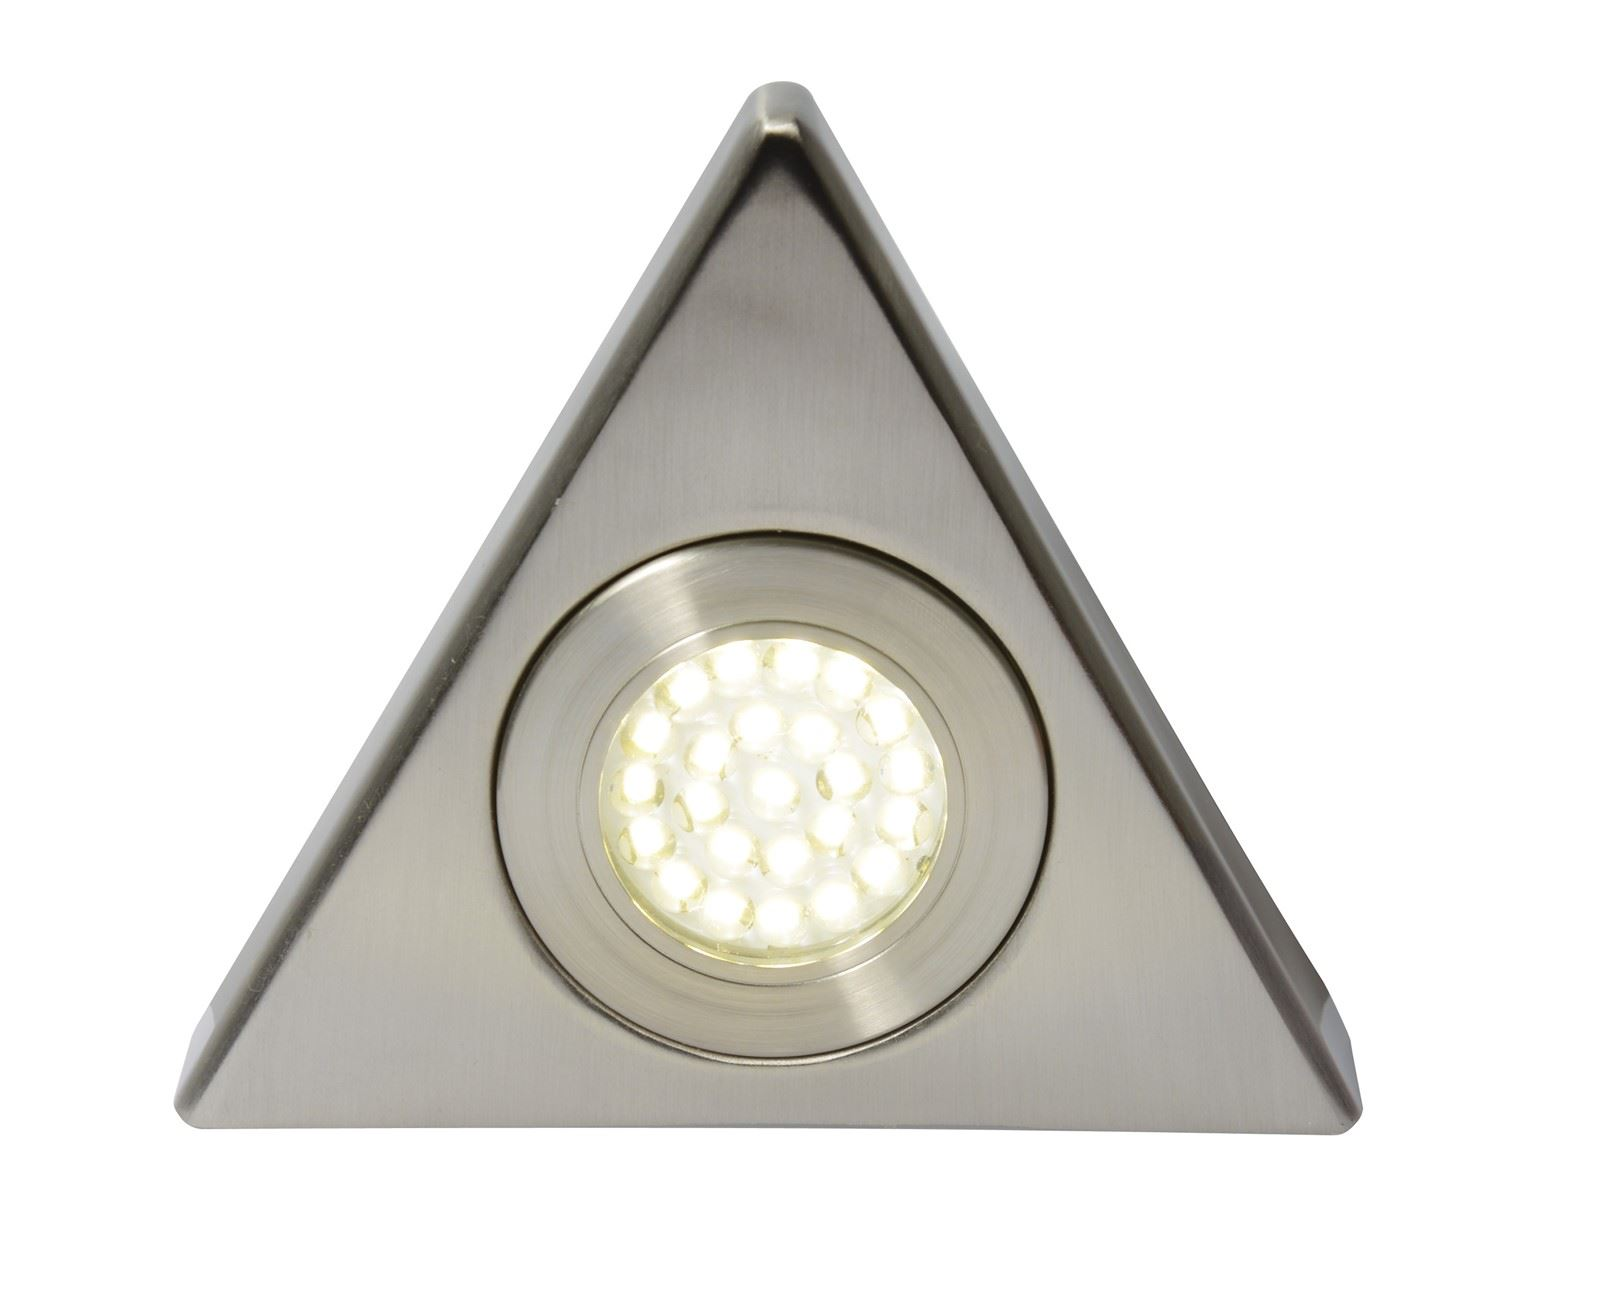 Fonte Led, Mains Voltage, Triangular Cabinet Light, 4000K Cool White